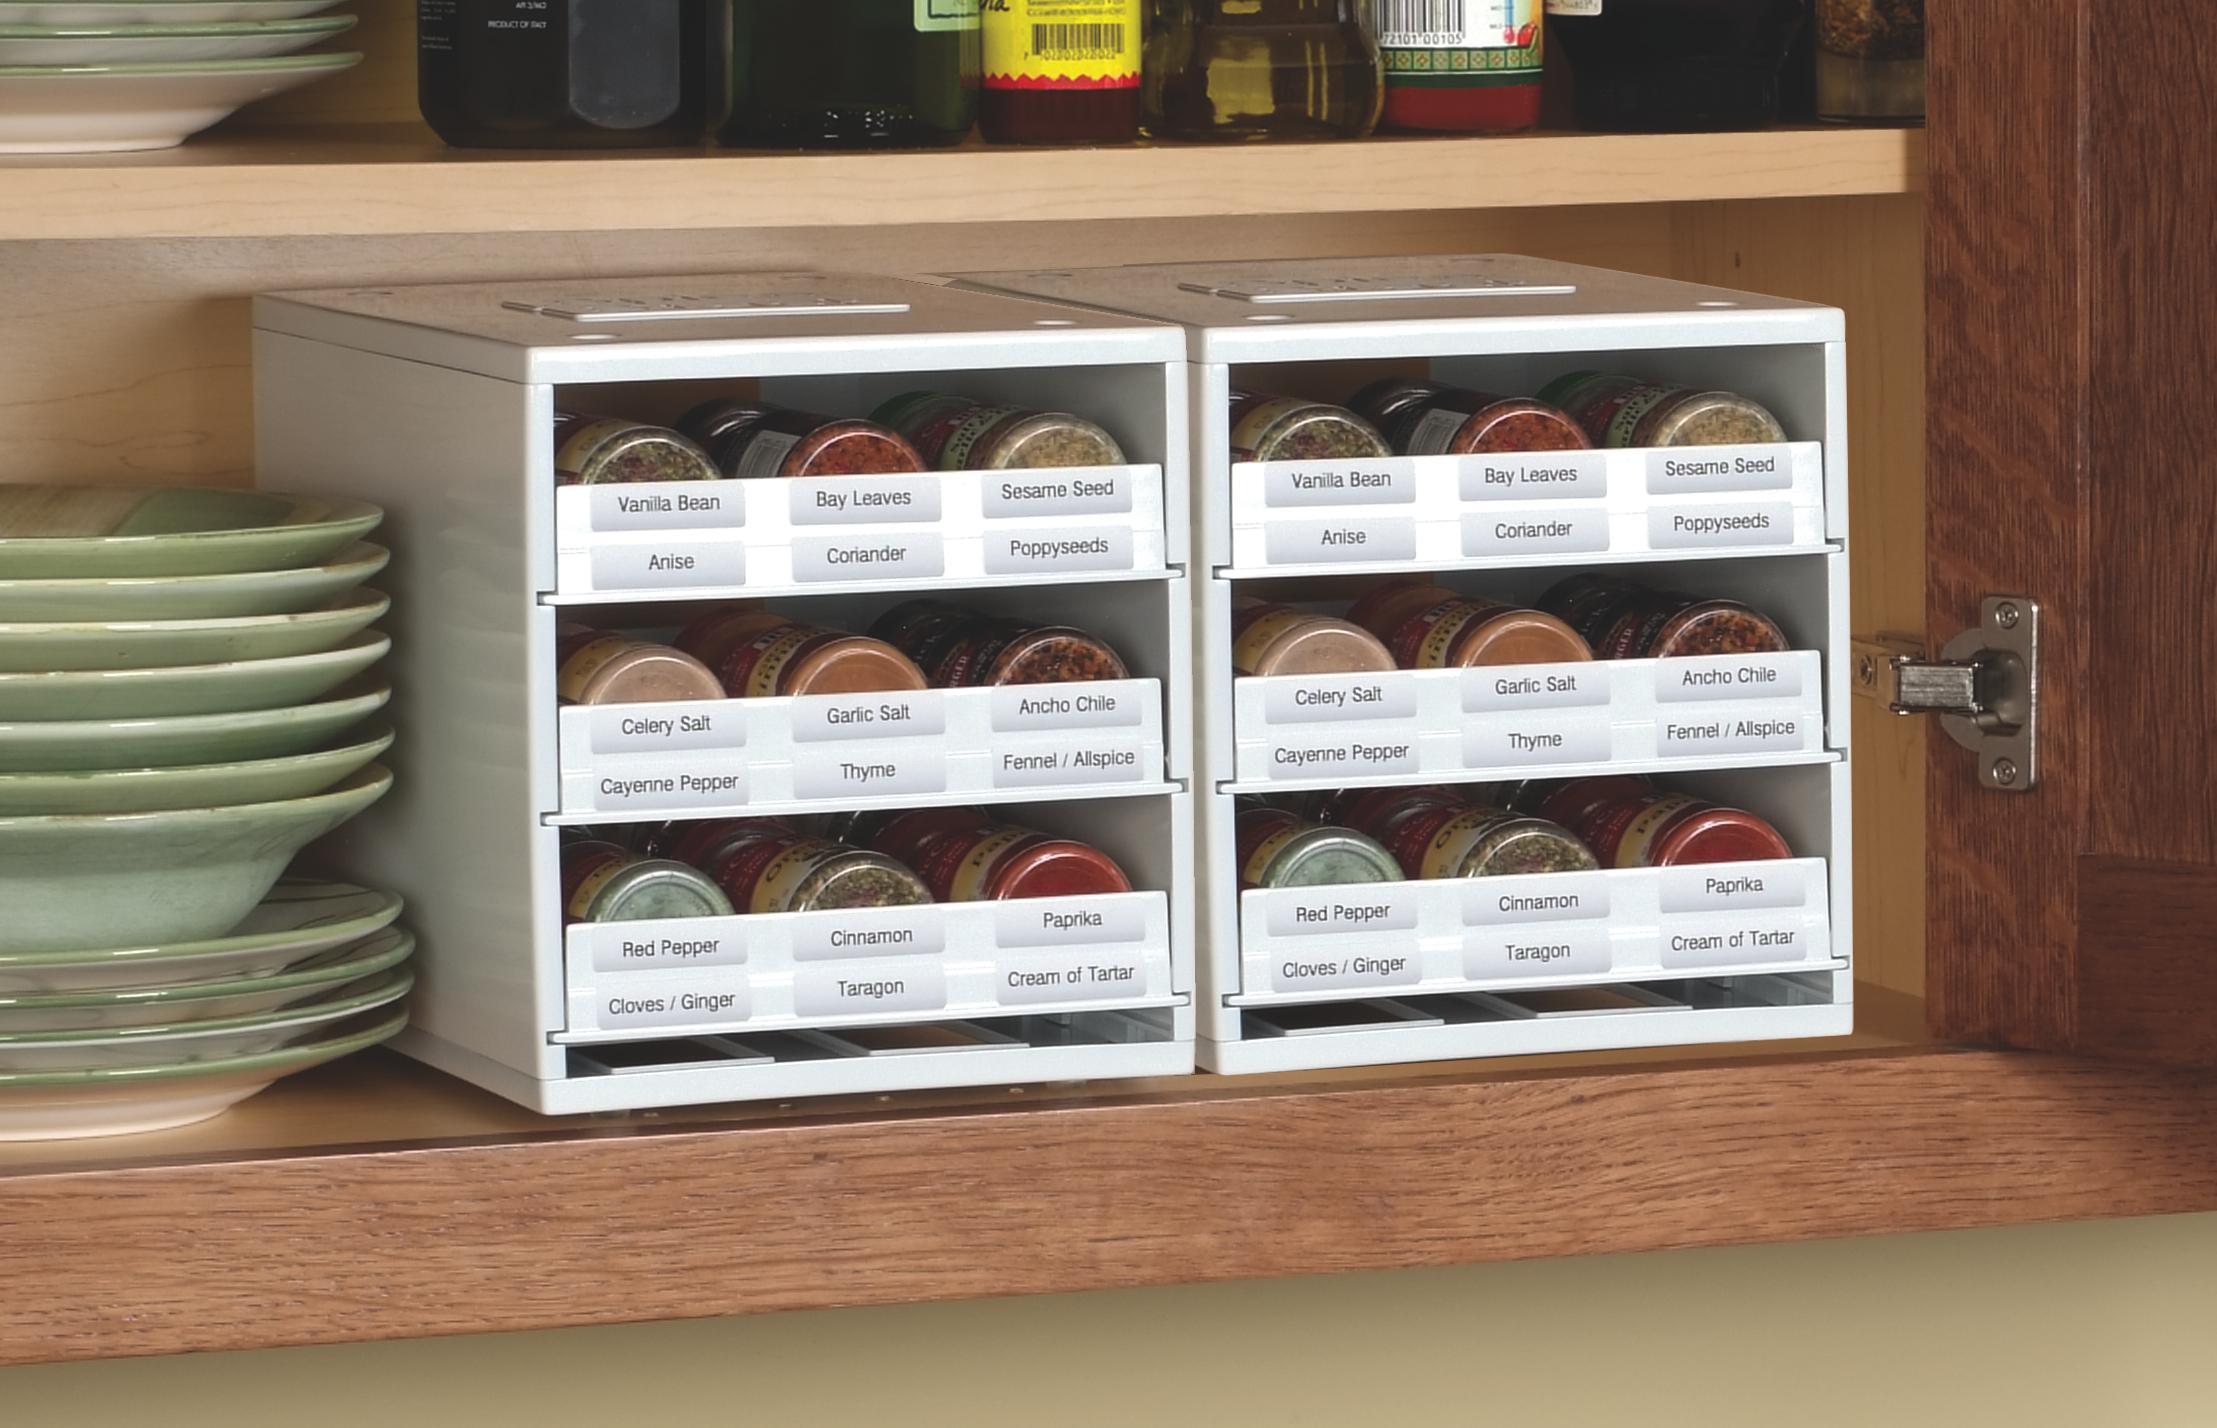 New SpiceStack Spice Rack Helps NotSoOrganized Cooks